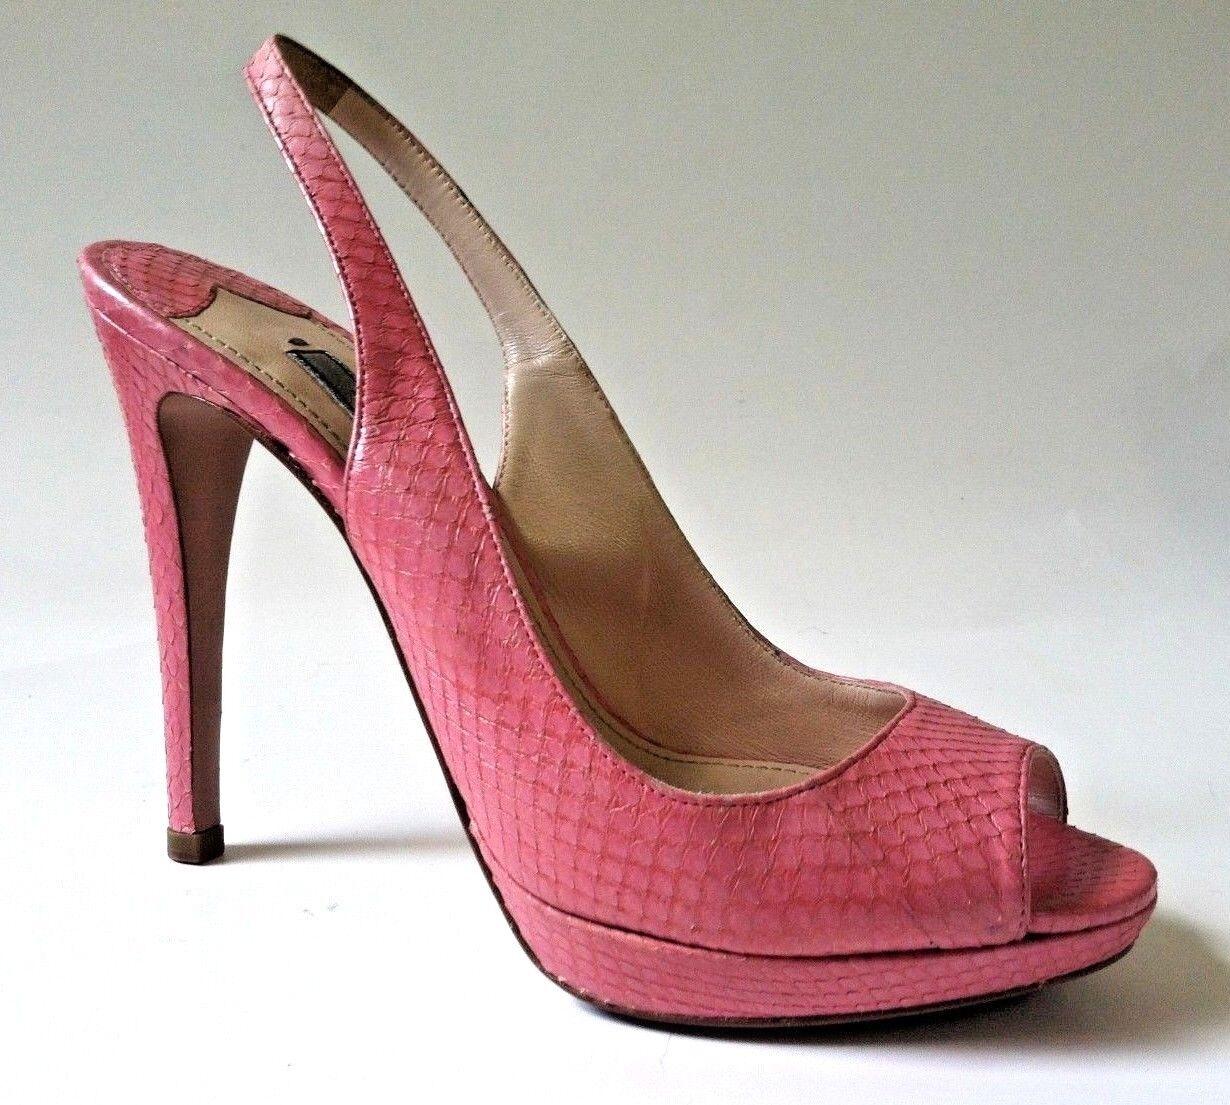 Prada damen schuhe high heel Rosa snake snake snake skin peep toe stiletto Größe 8  800 e68db9